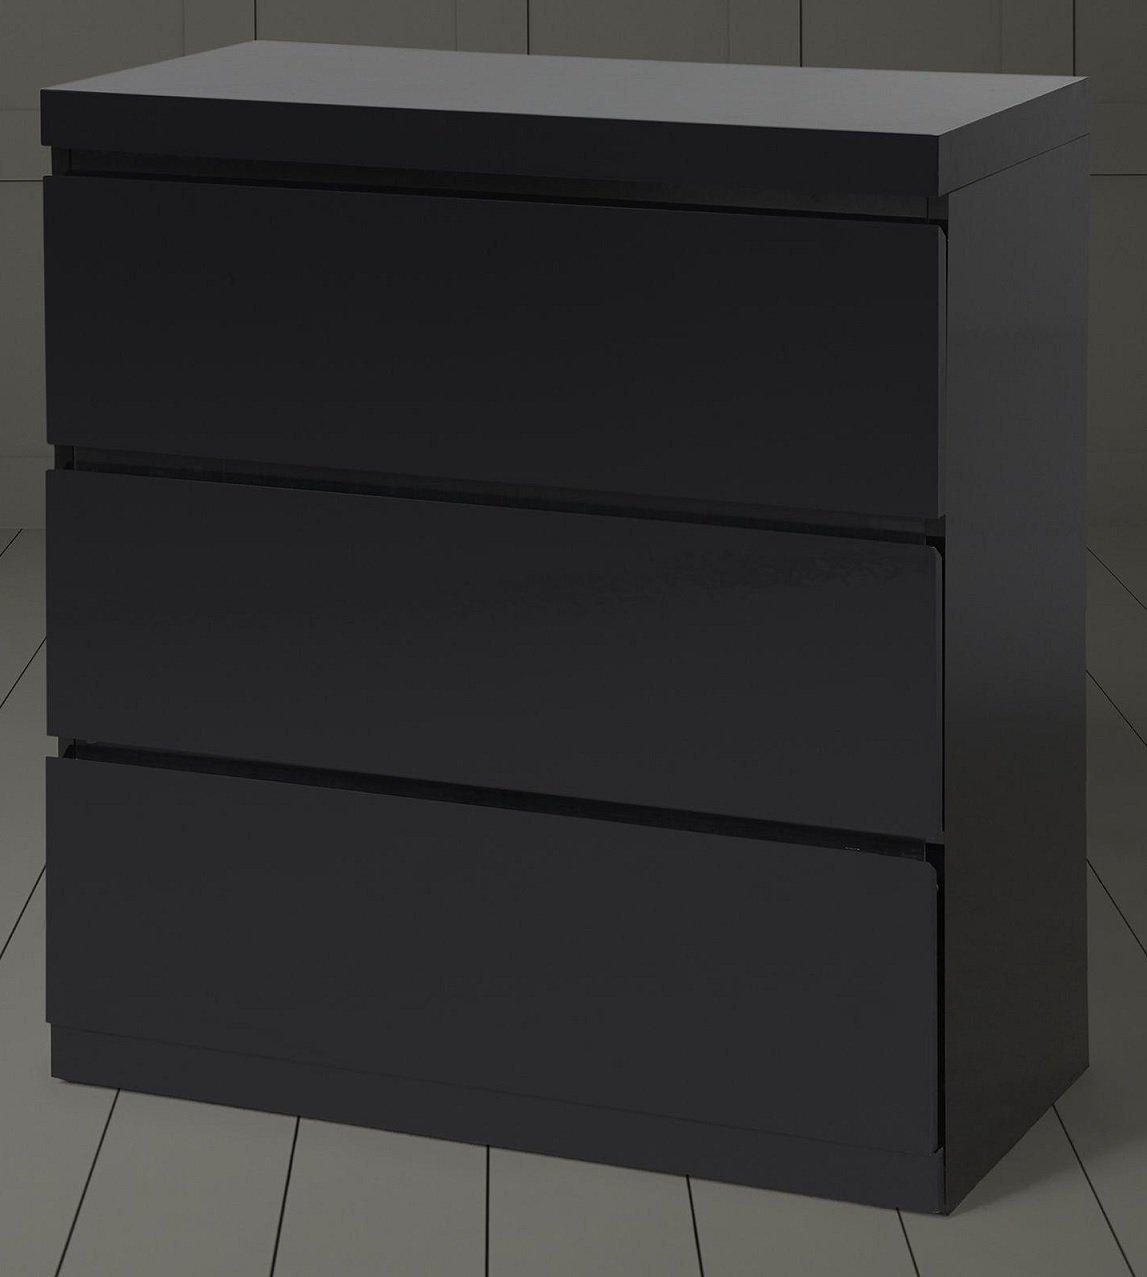 Tesco NEW Maine High Gloss Chest of 3 Drawers - Black